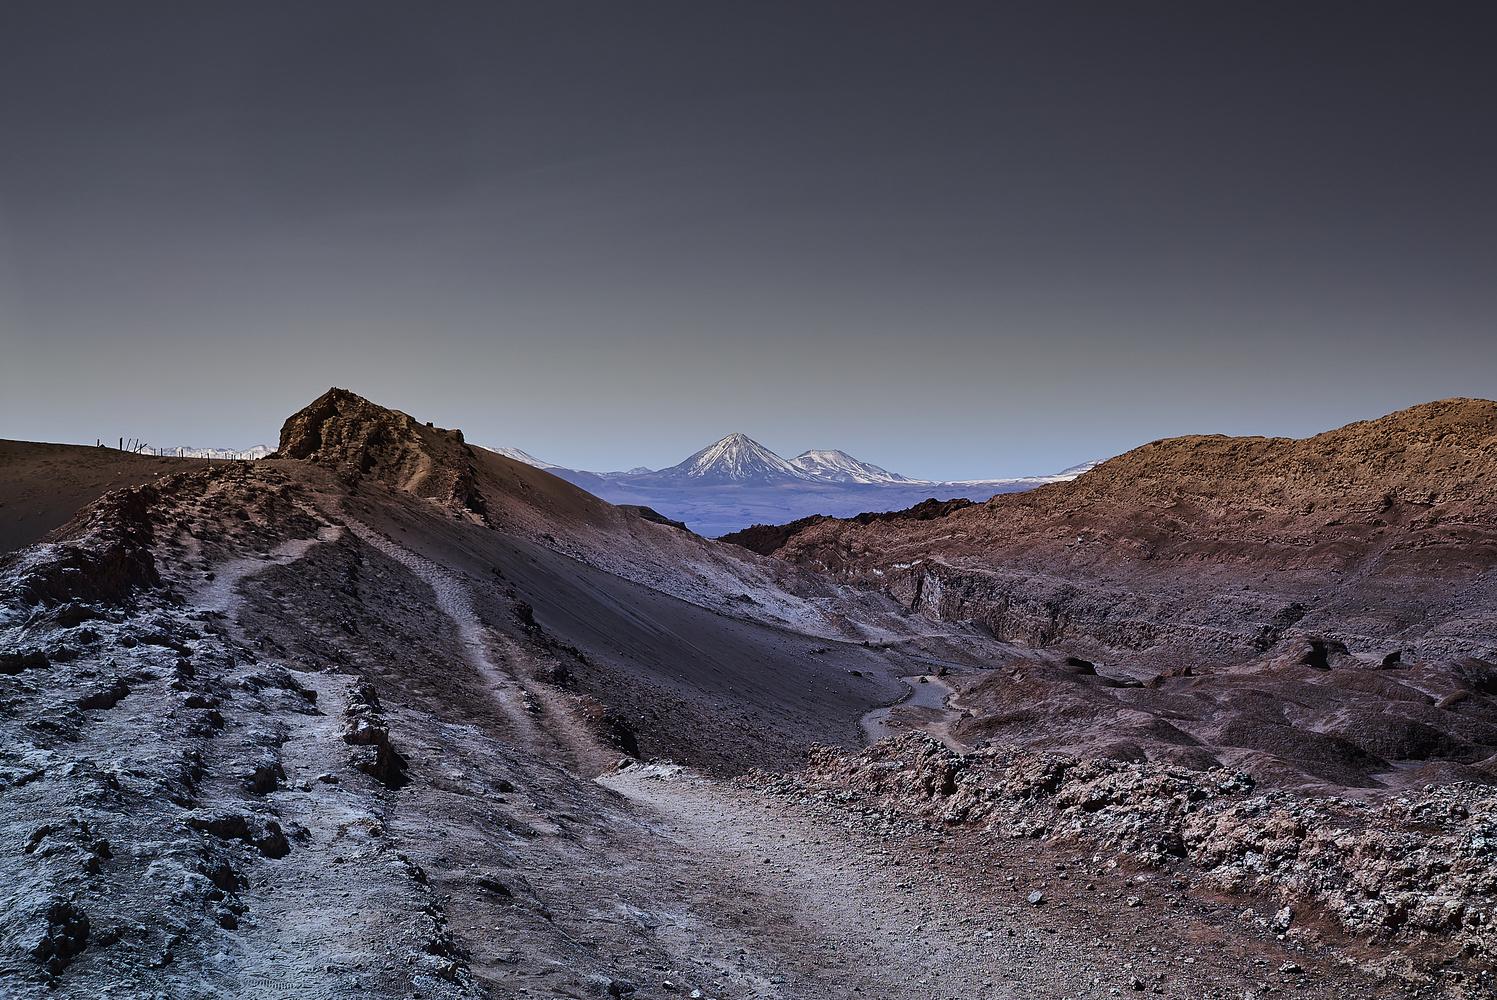 Moon Valley by Manuel Fuentes